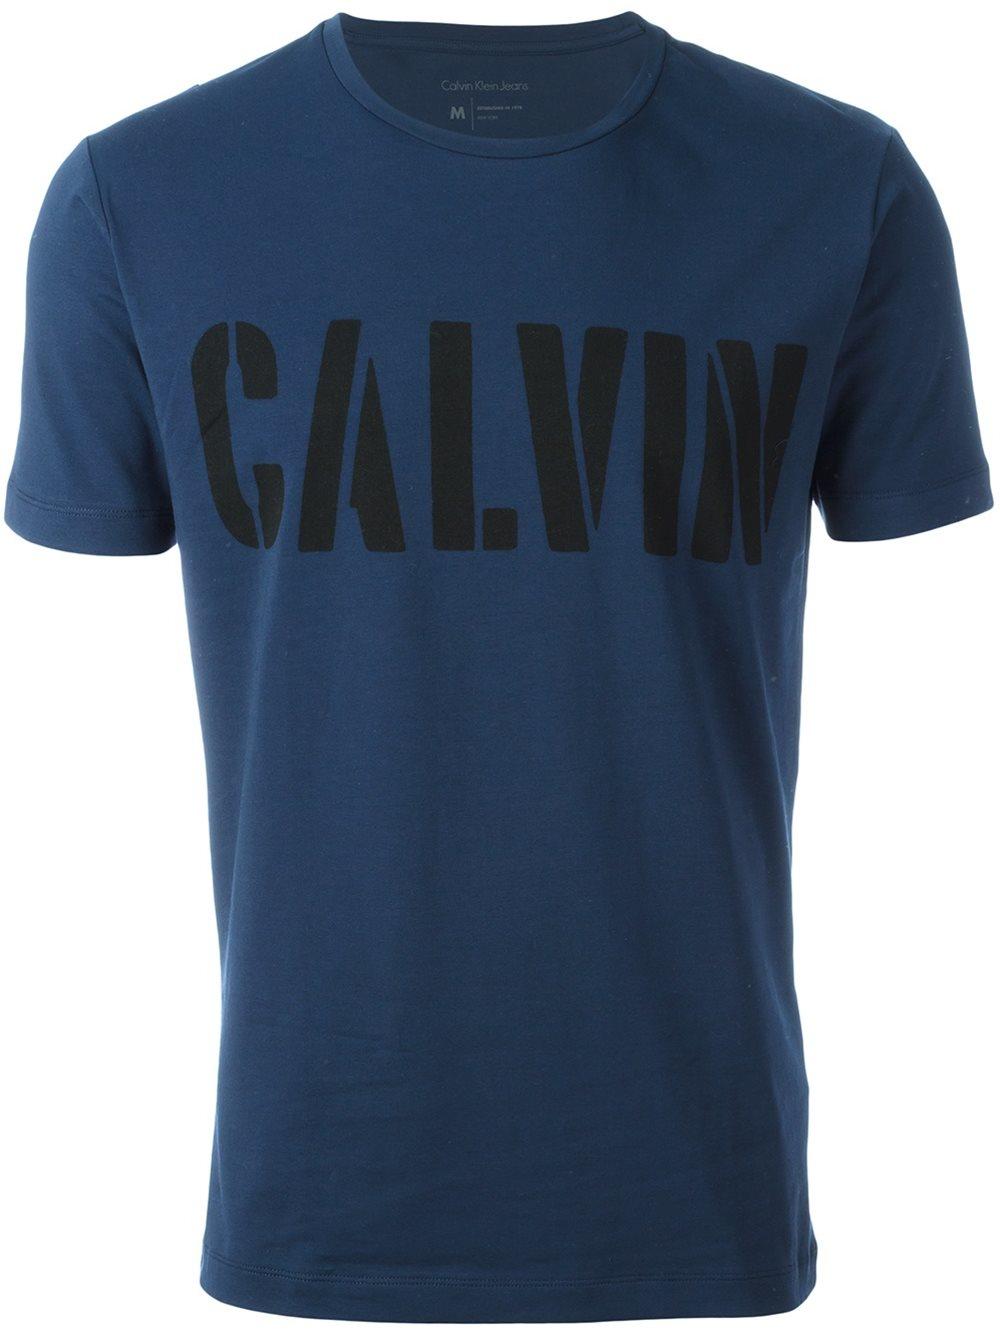 Calvin klein jeans logo print t shirt in blue for men lyst for Lands end logo shirts